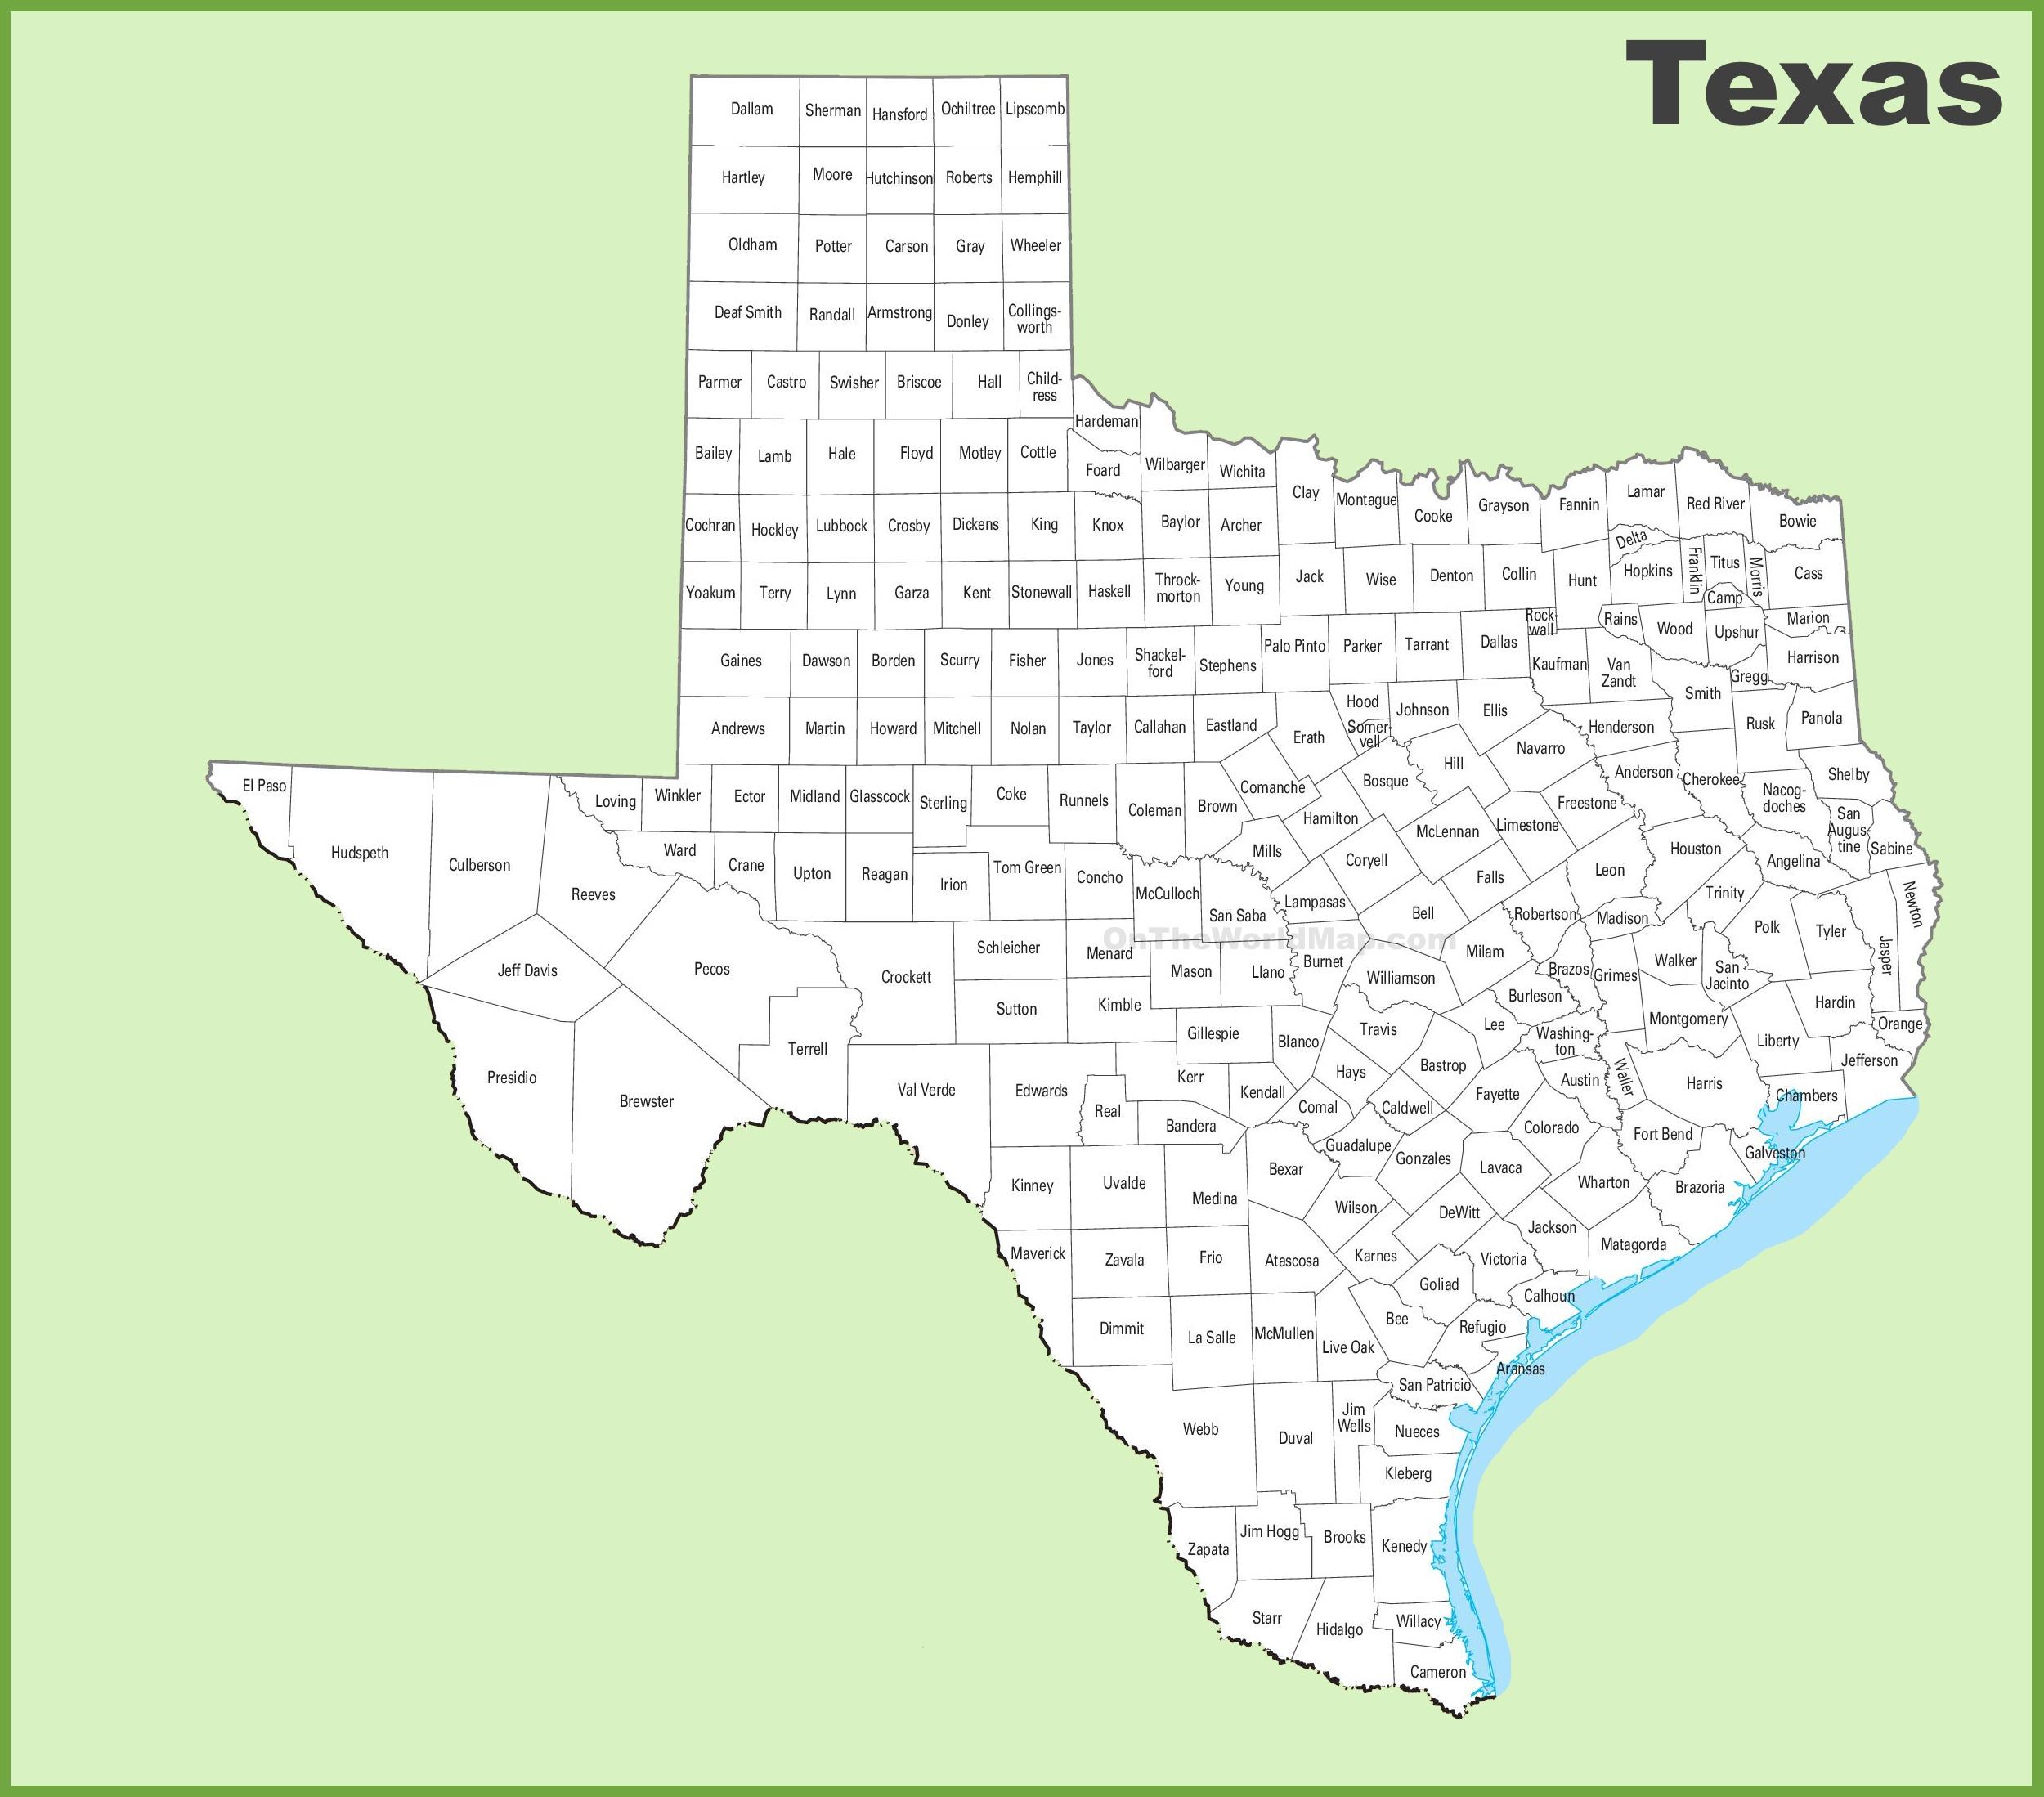 Texas State Maps   Usa   Maps Of Texas (Tx) - Show Me A Map Of Texas Usa